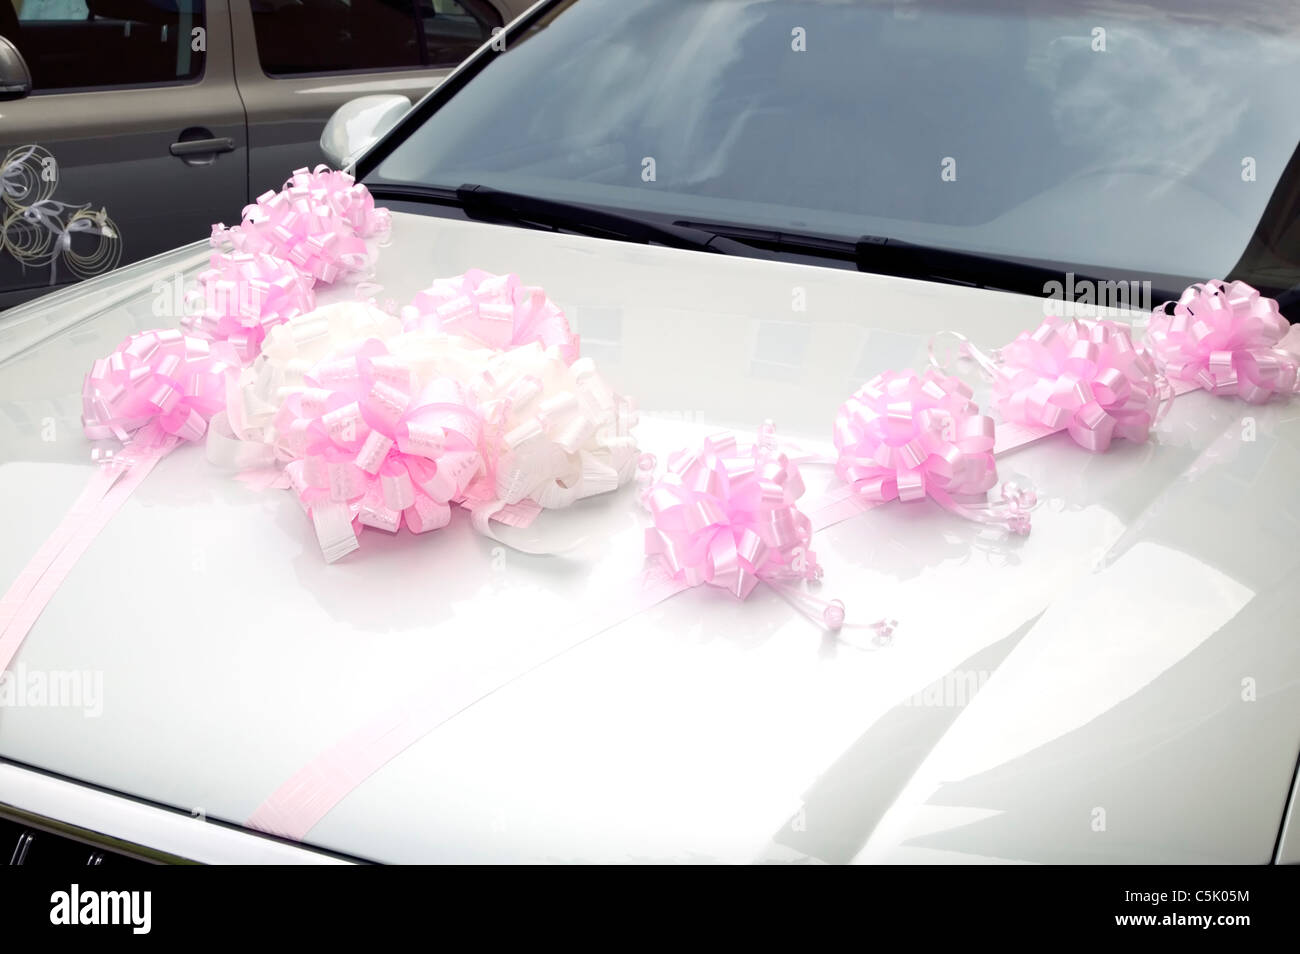 Wedding Car Decorations Stock Photos & Wedding Car Decorations Stock ...